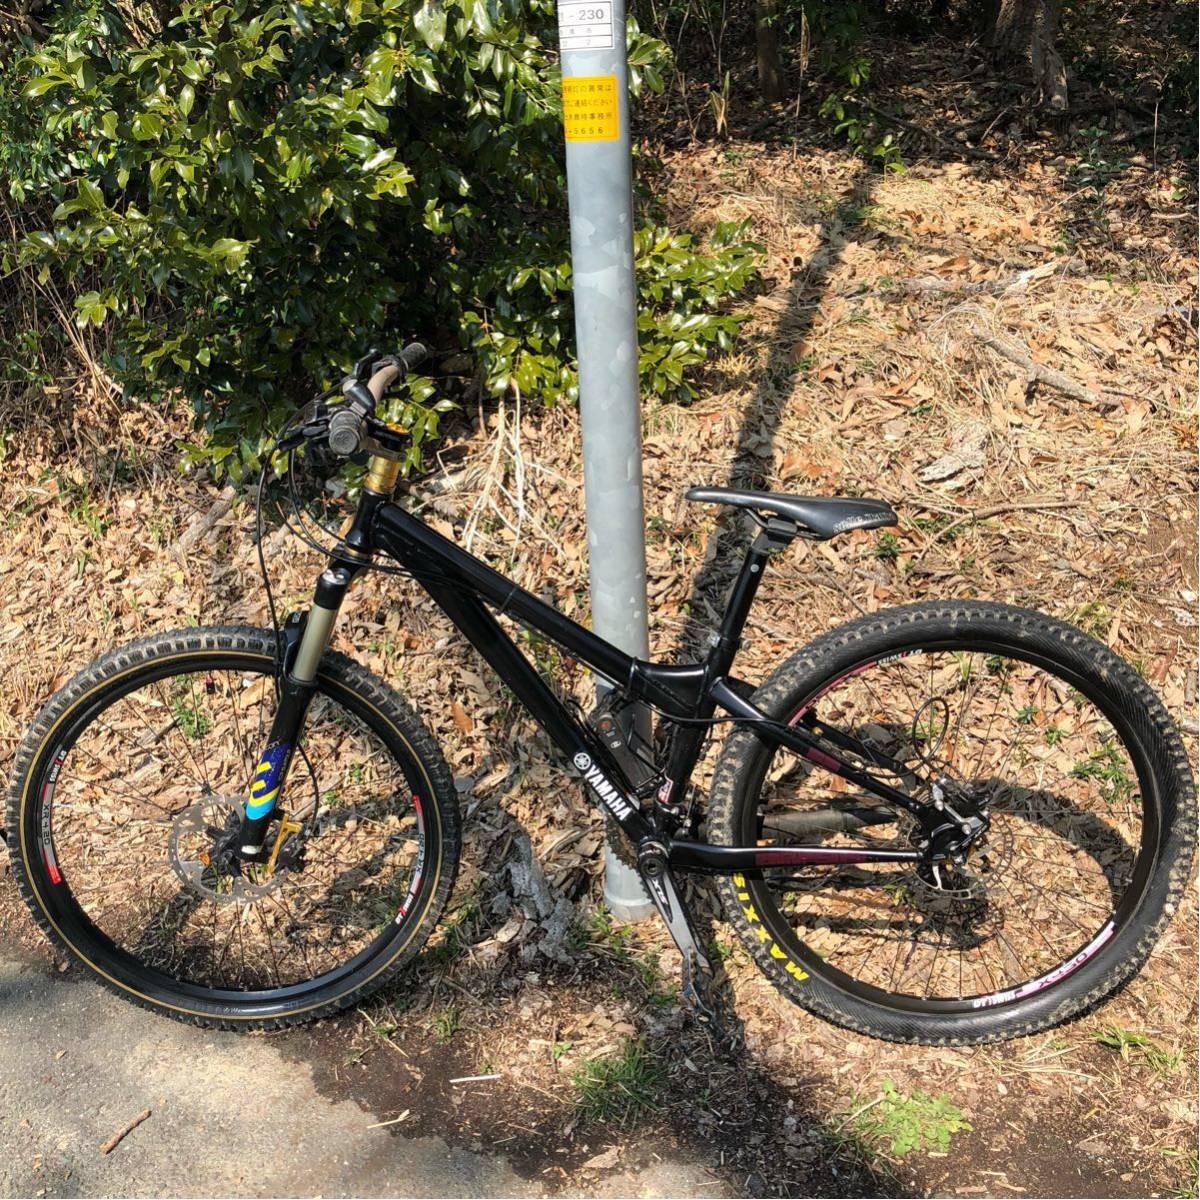 TREK GaryFisher MTB 改造多数 26 ストリート ダウンヒル トライアル BMX マウンテンバイク cannondale specialized fuji giant kona _画像2